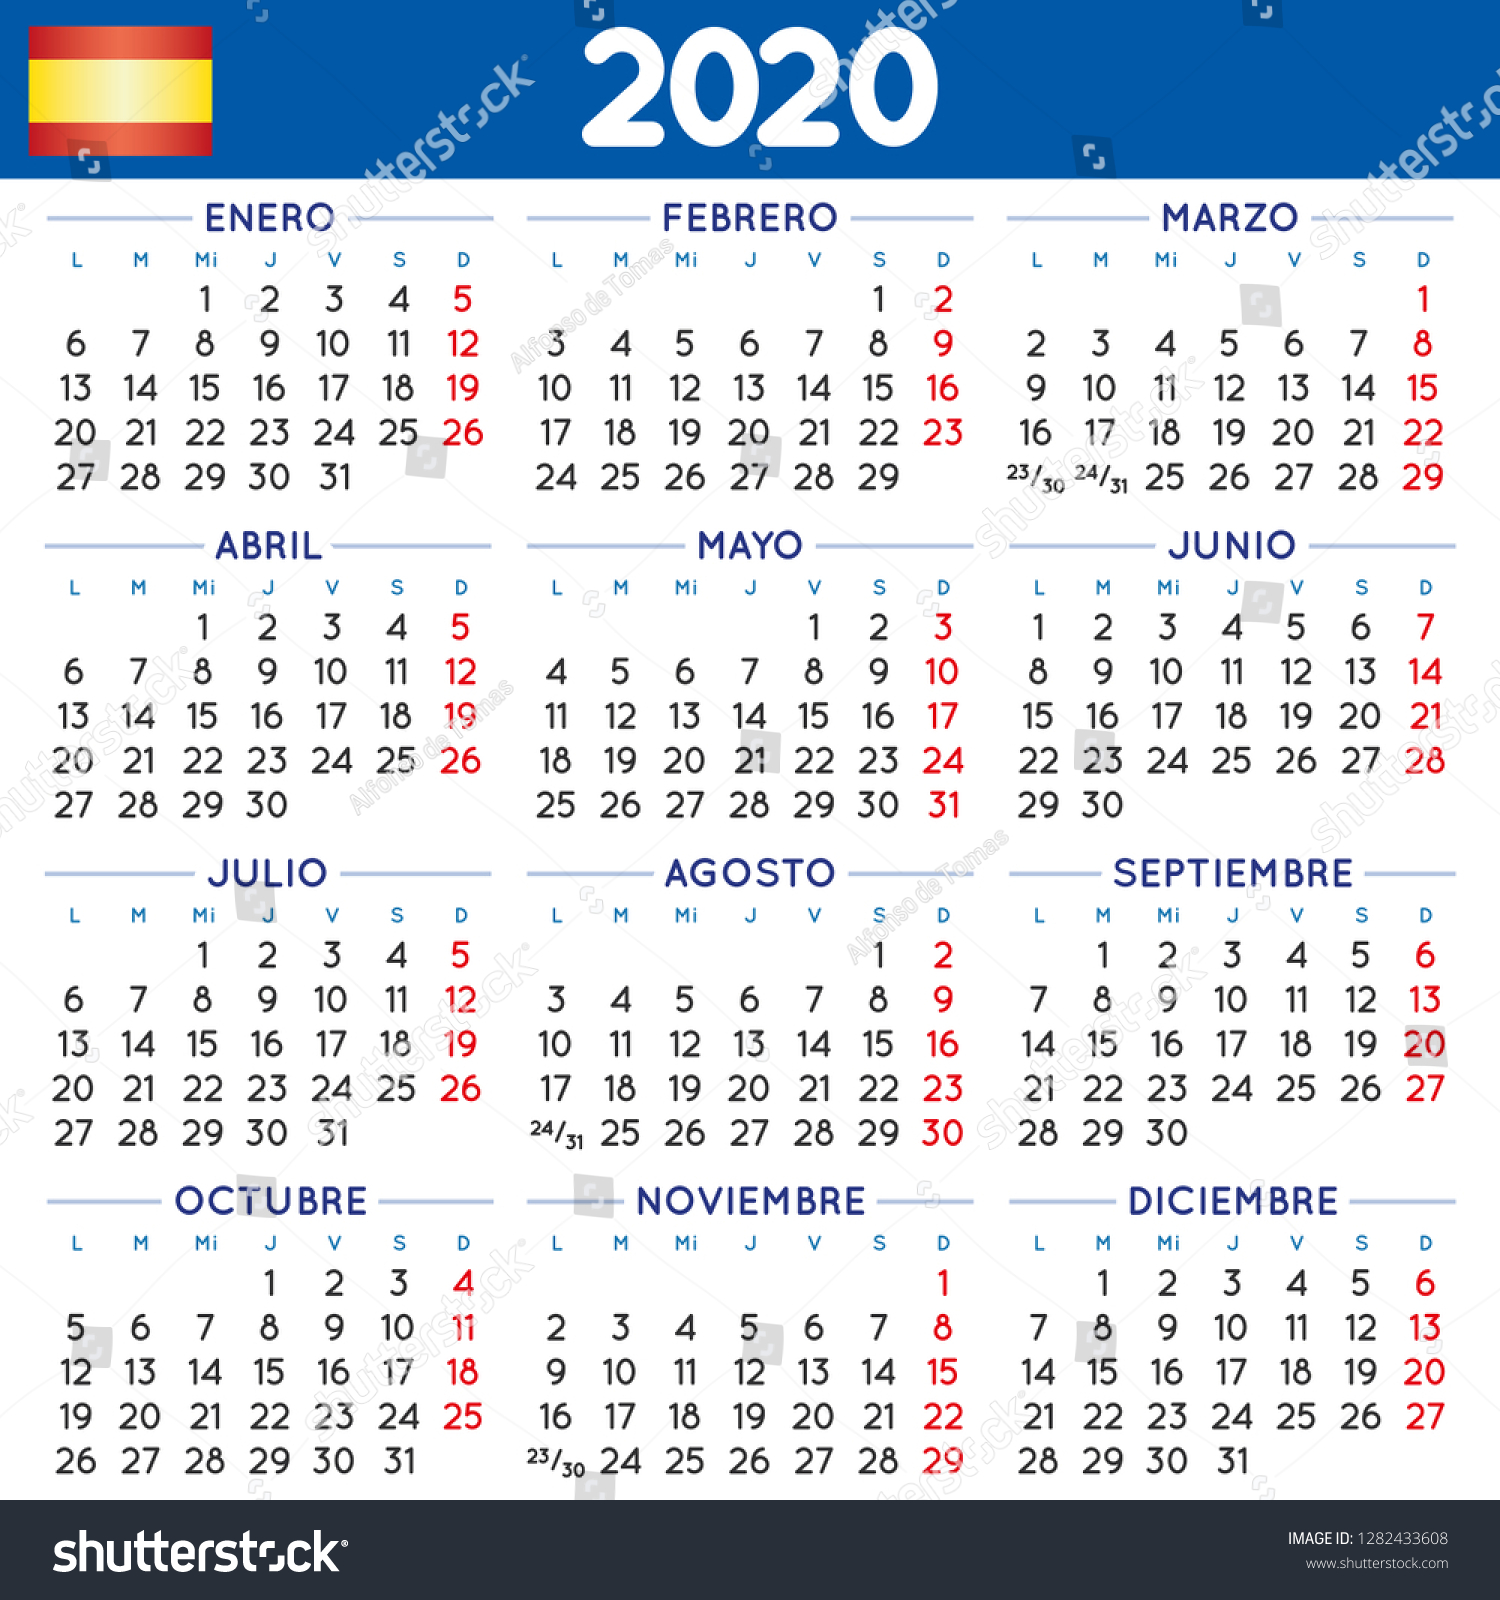 Calendario Marzo 2020.2020 Elegant Squared Calendar Spanish Year Stock Vector